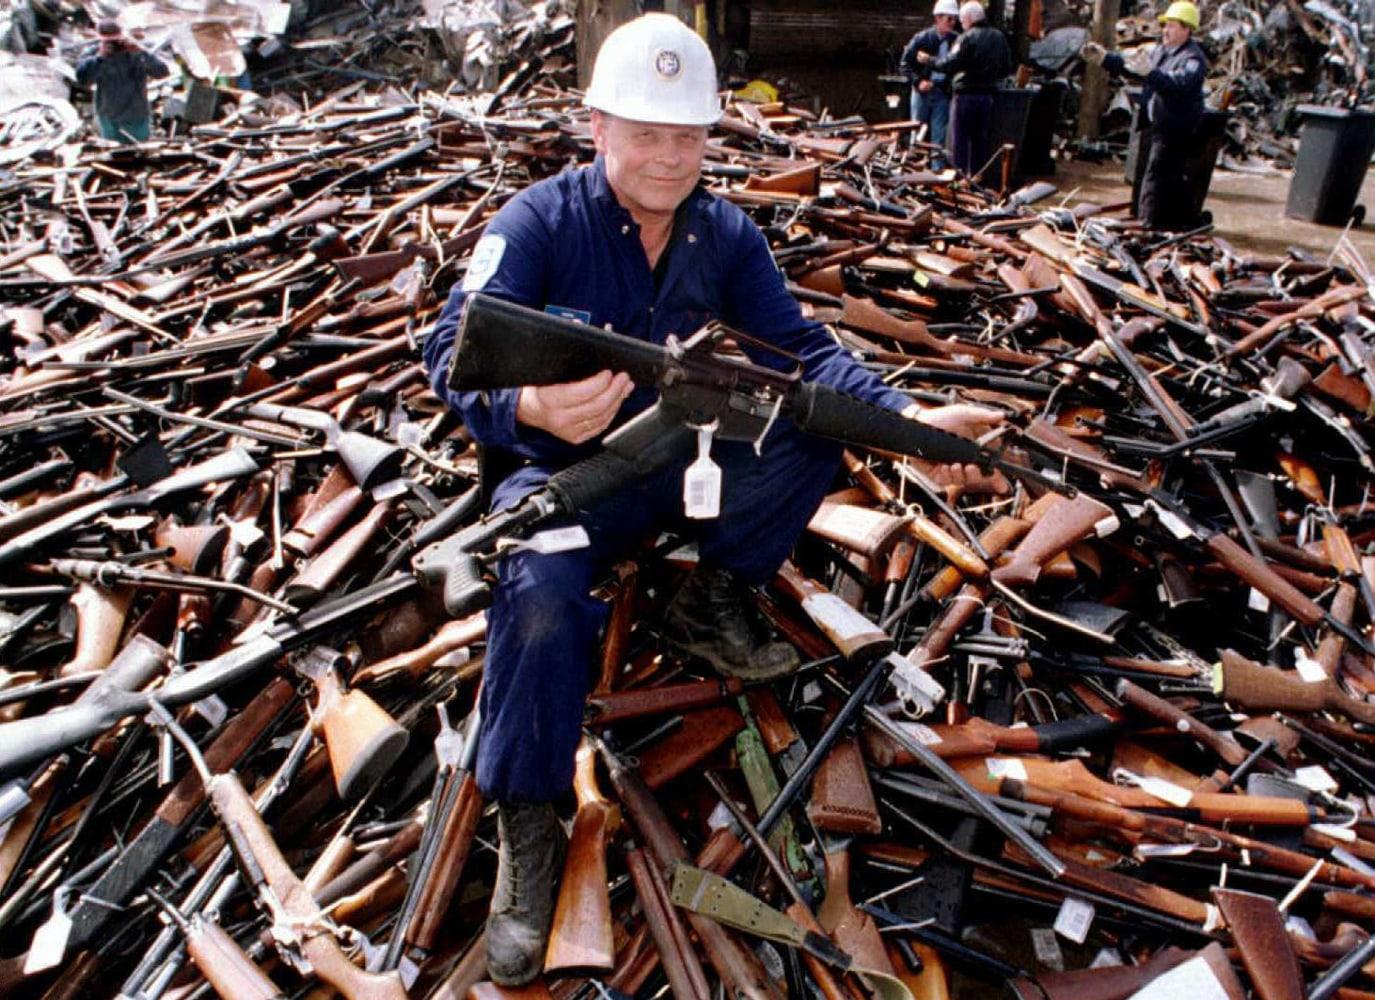 Port Arthur Australia  City pictures : Port Arthur Massacre: The Shooting Spree That Changed Australia Gun ...